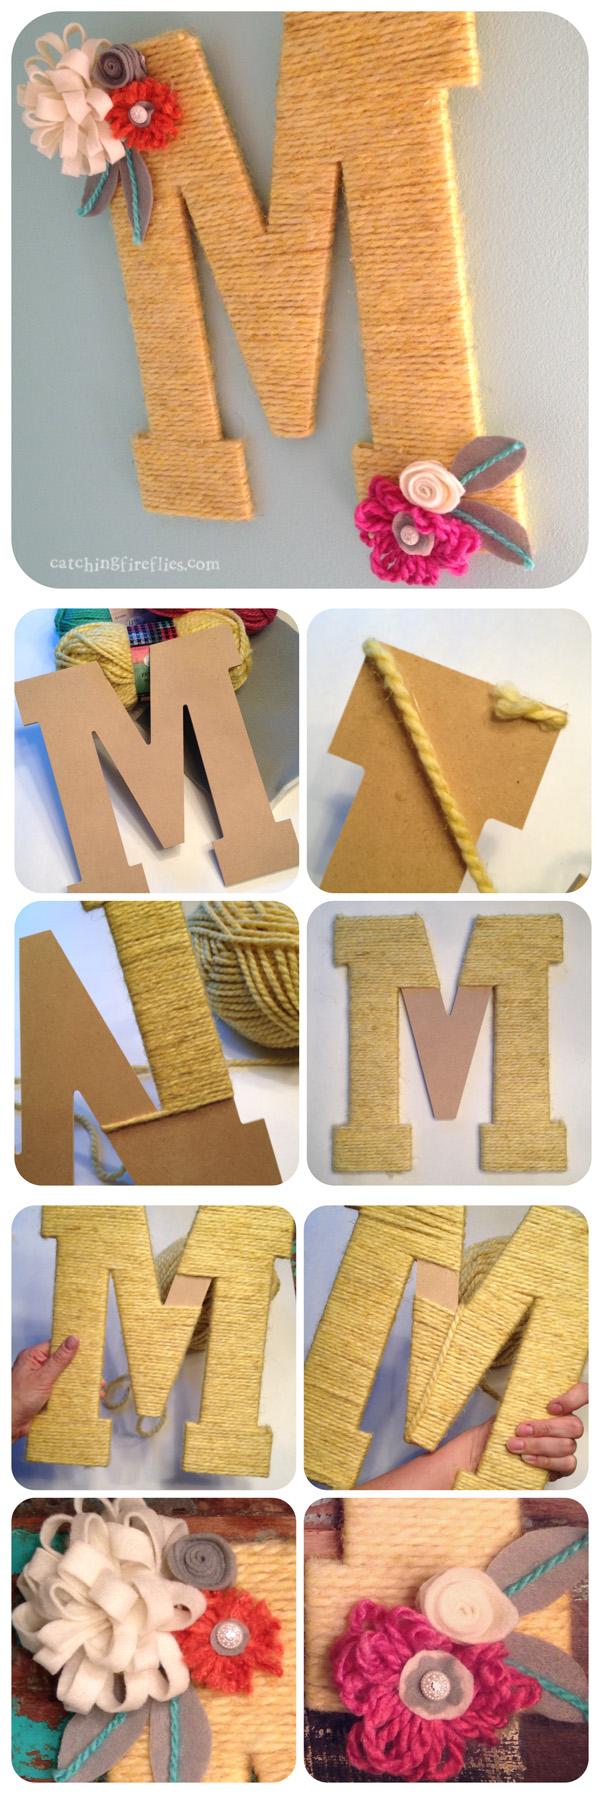 DIY Nursery Decor | creative gift ideas & news at catching ...